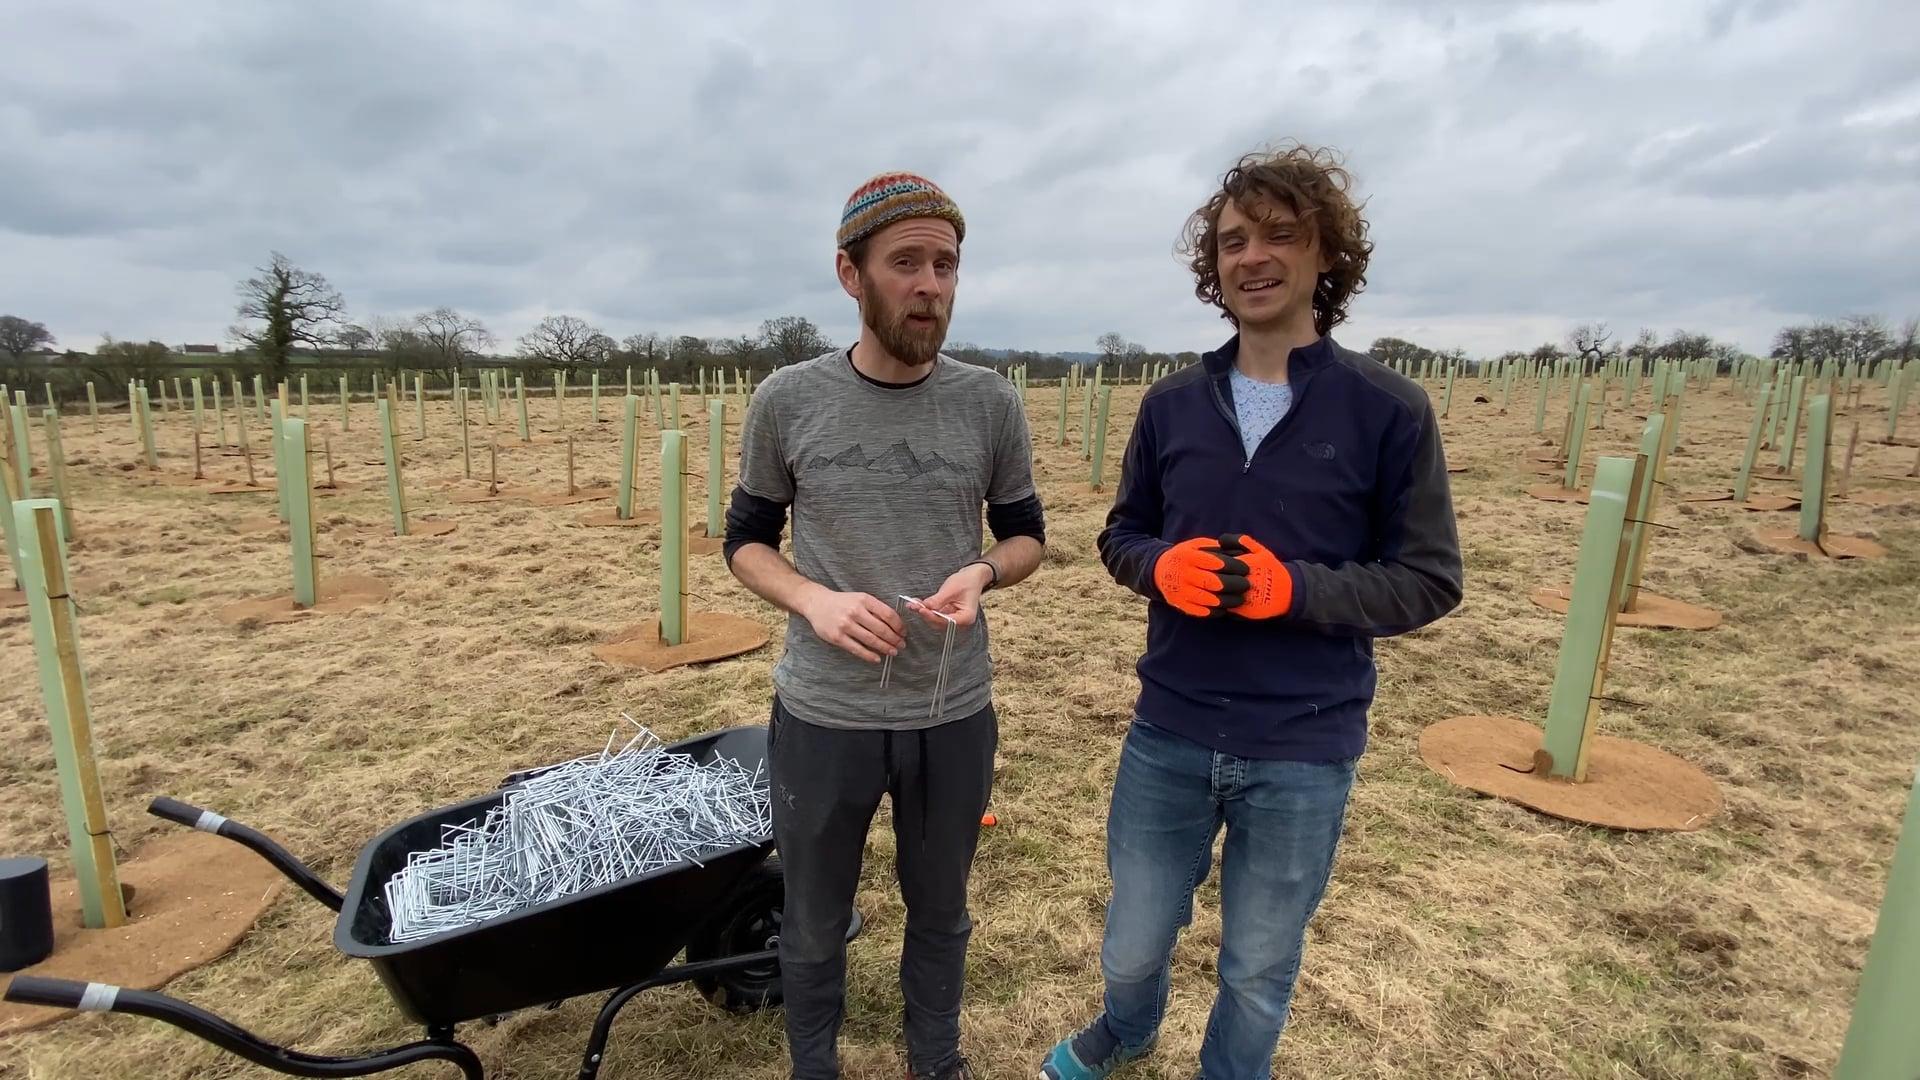 Ninebarrow Woodland Update - Saturday 20th March